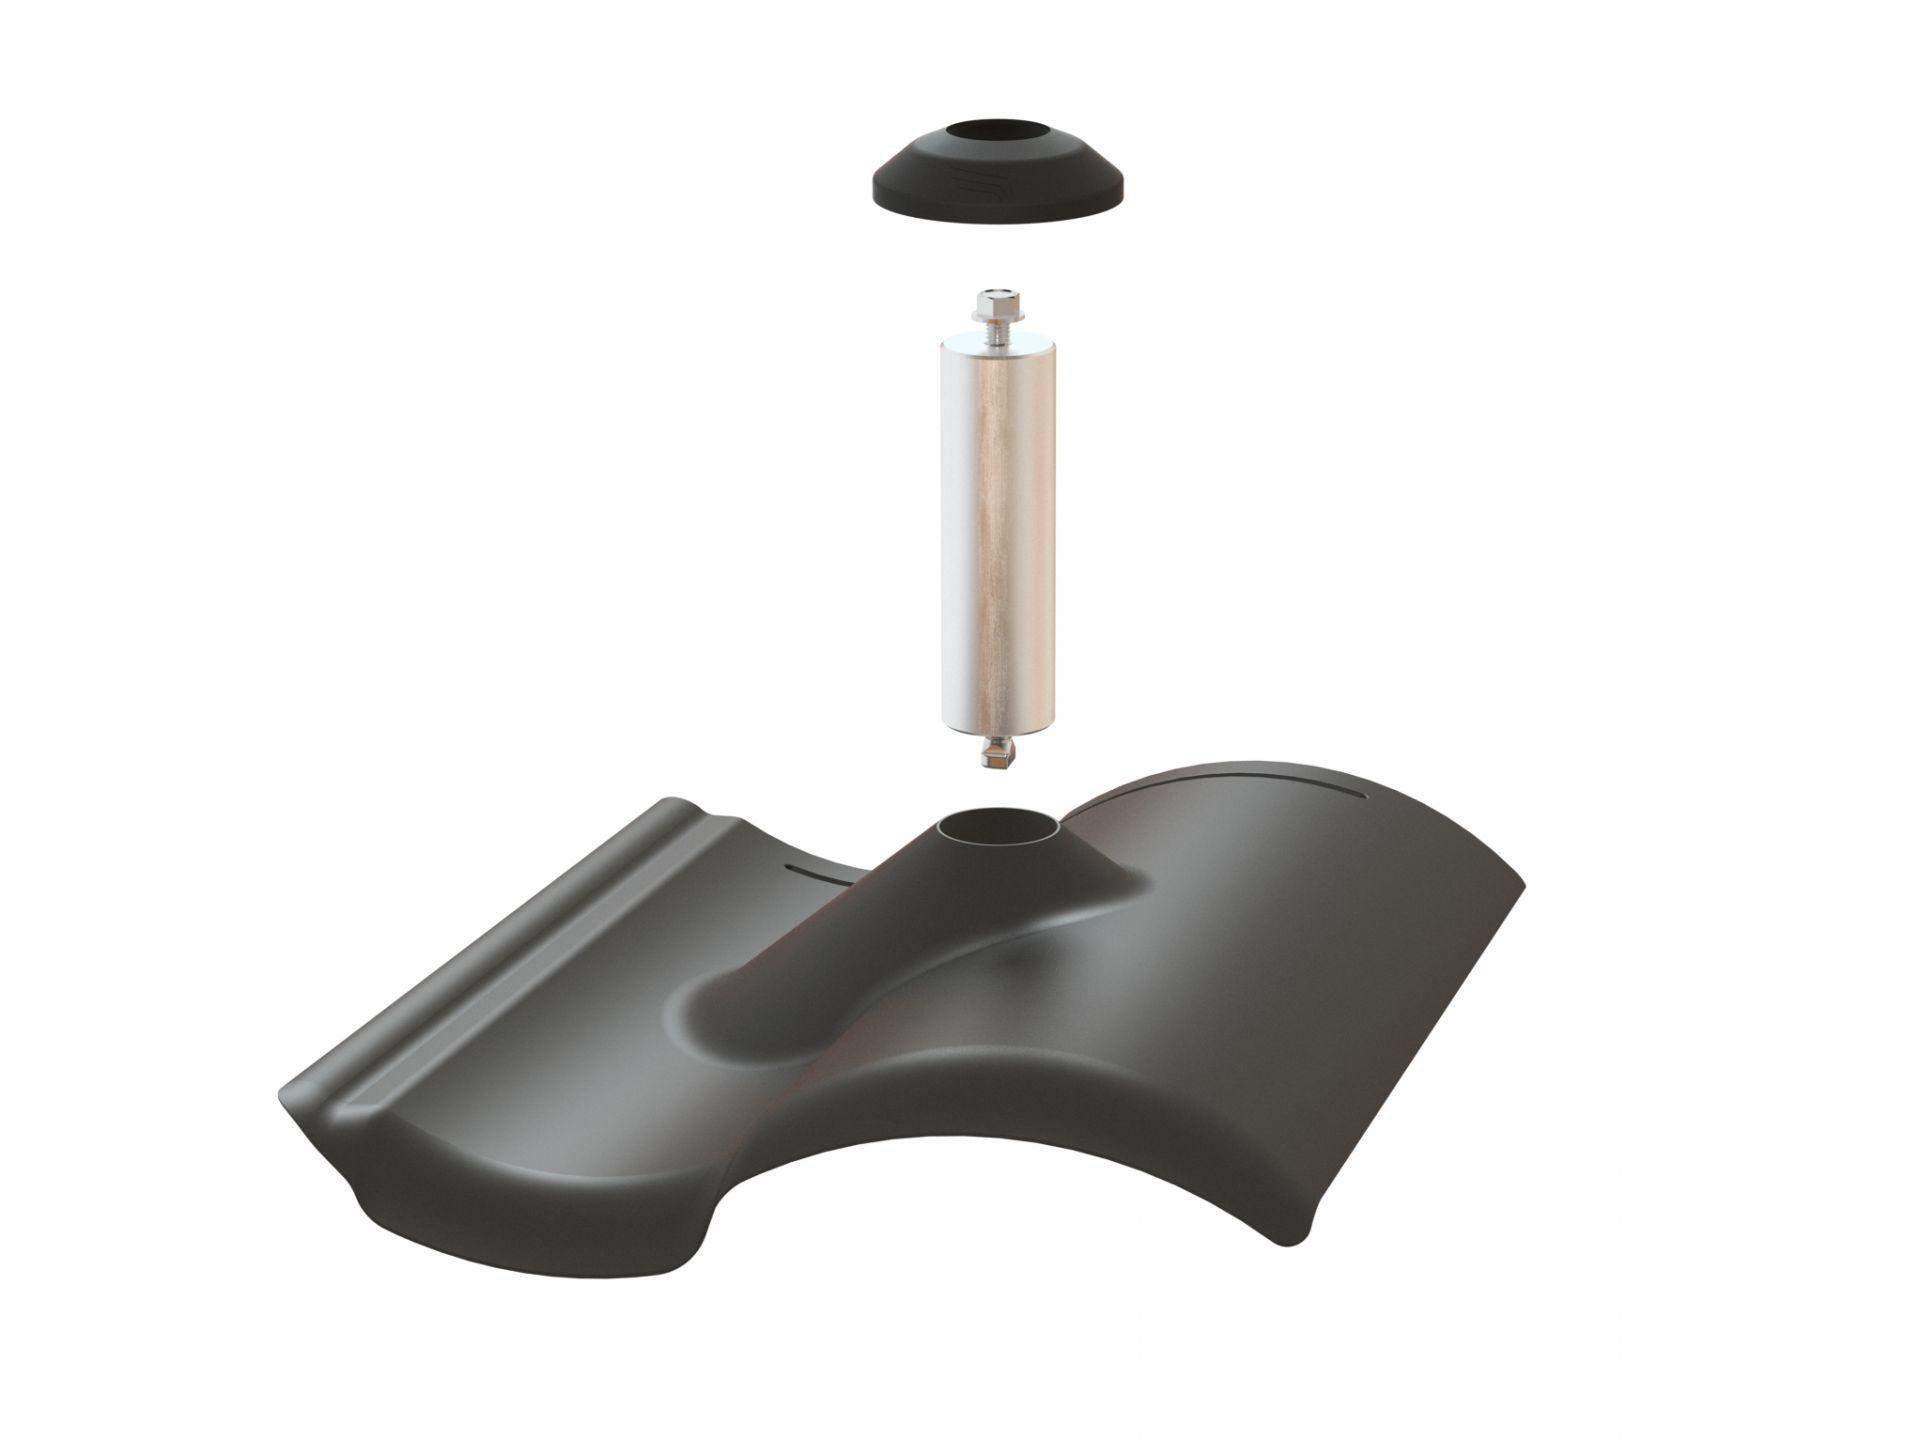 Pegasus Solar S-Tile Flashing w/ Post & EPDM Boot, Black, PSTR-FSB0